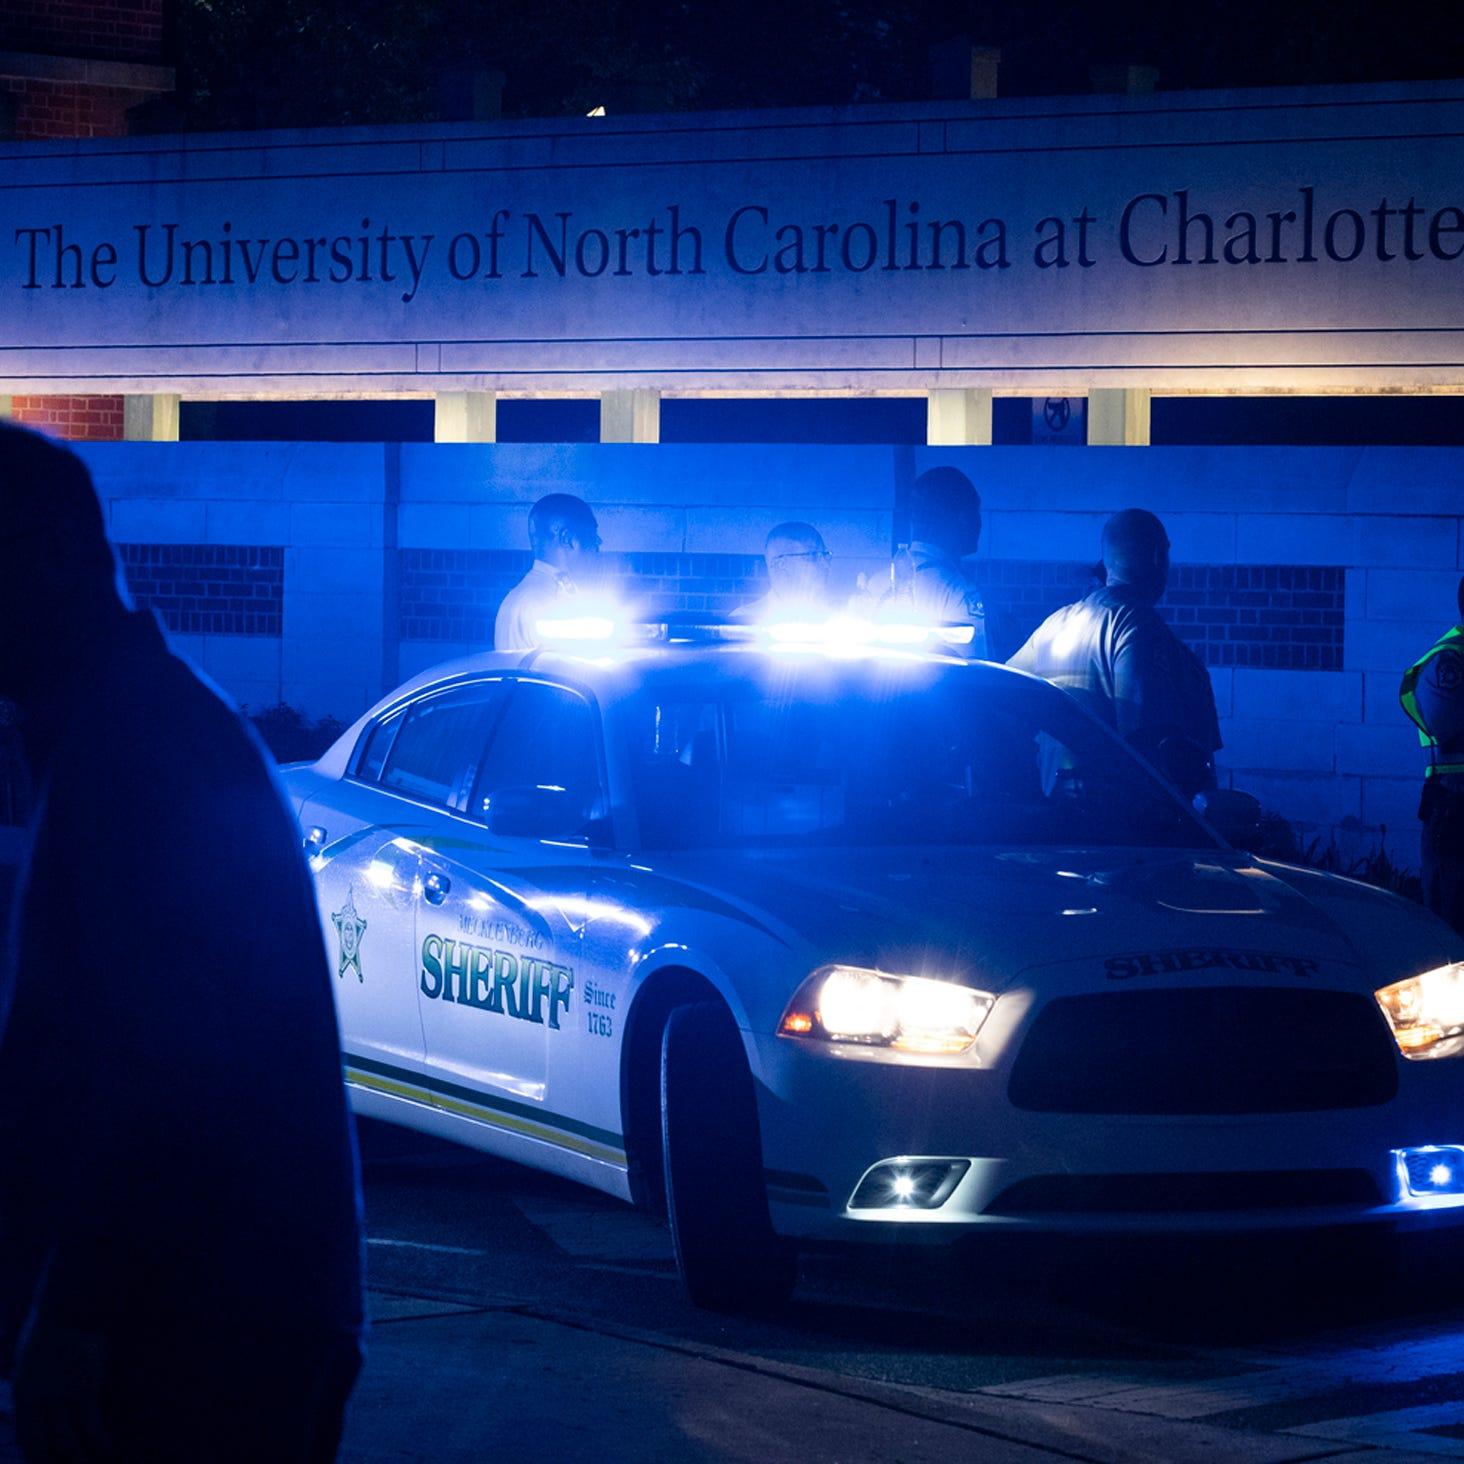 2 dead, 4 injured in North Carolina campus shooting